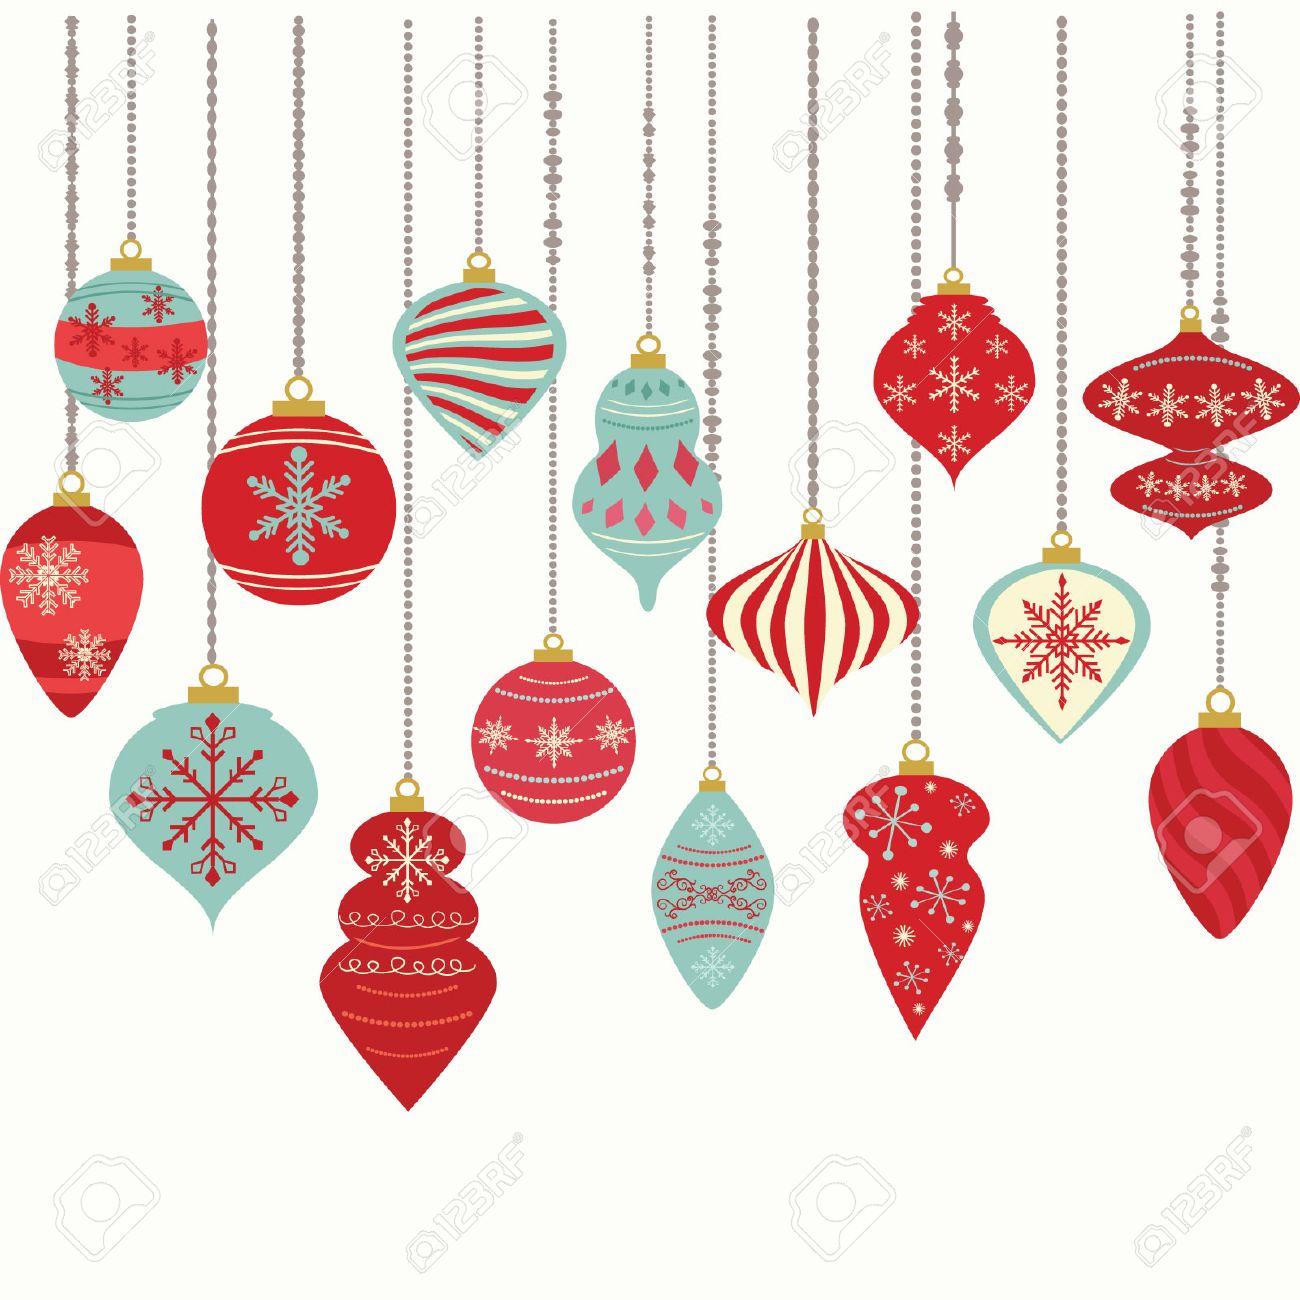 Career christmas ornaments - Christmas Ornaments Christmas Balls Decorations Christmas Hanging Decoration Set Stock Vector 47654466